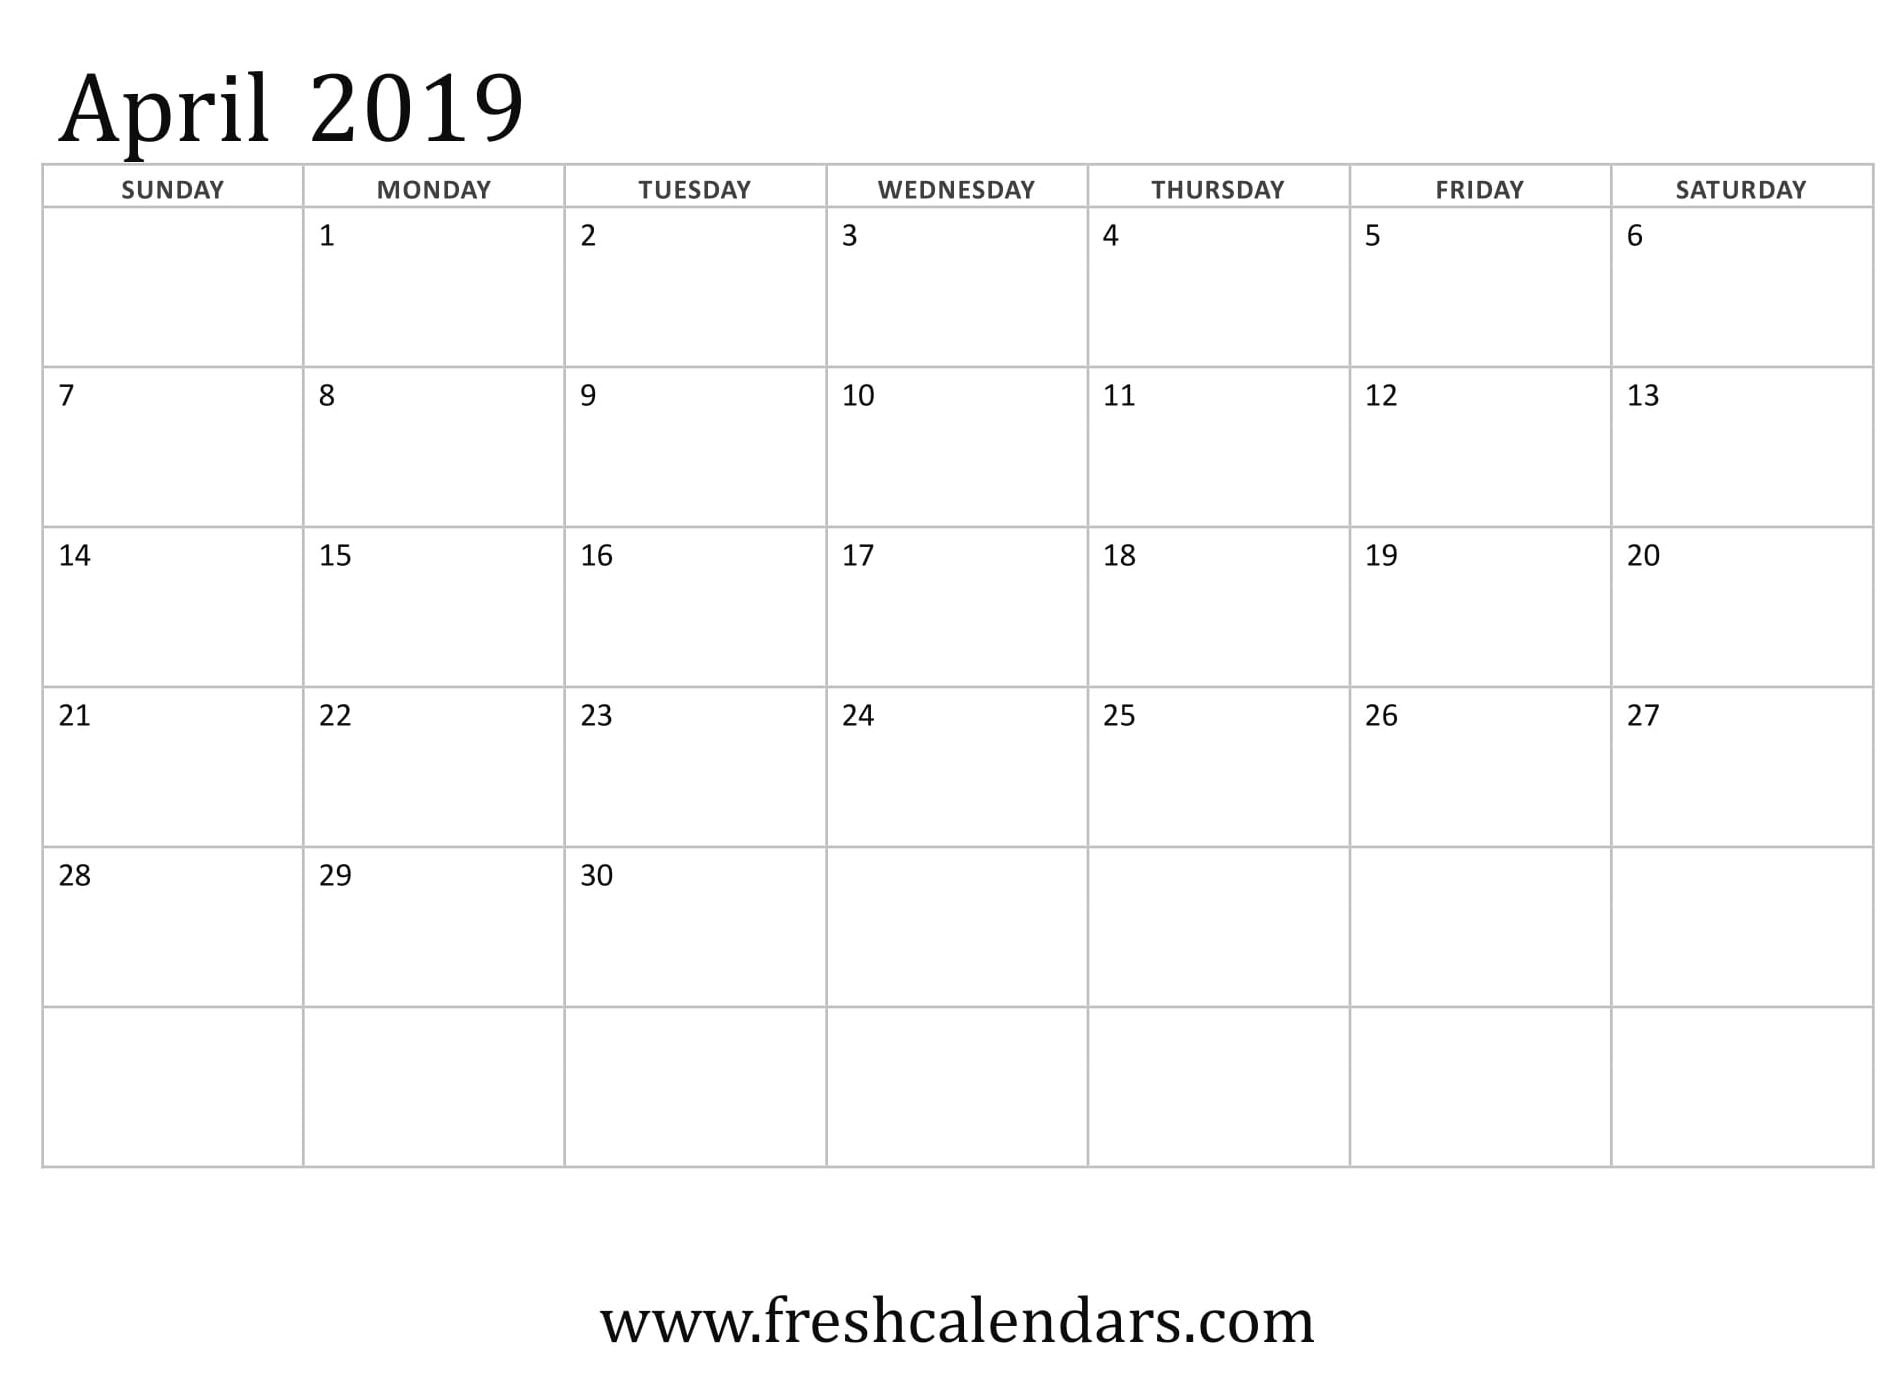 April 2019 Printable Calendars - Fresh Calendars Calendar Of 2019 April